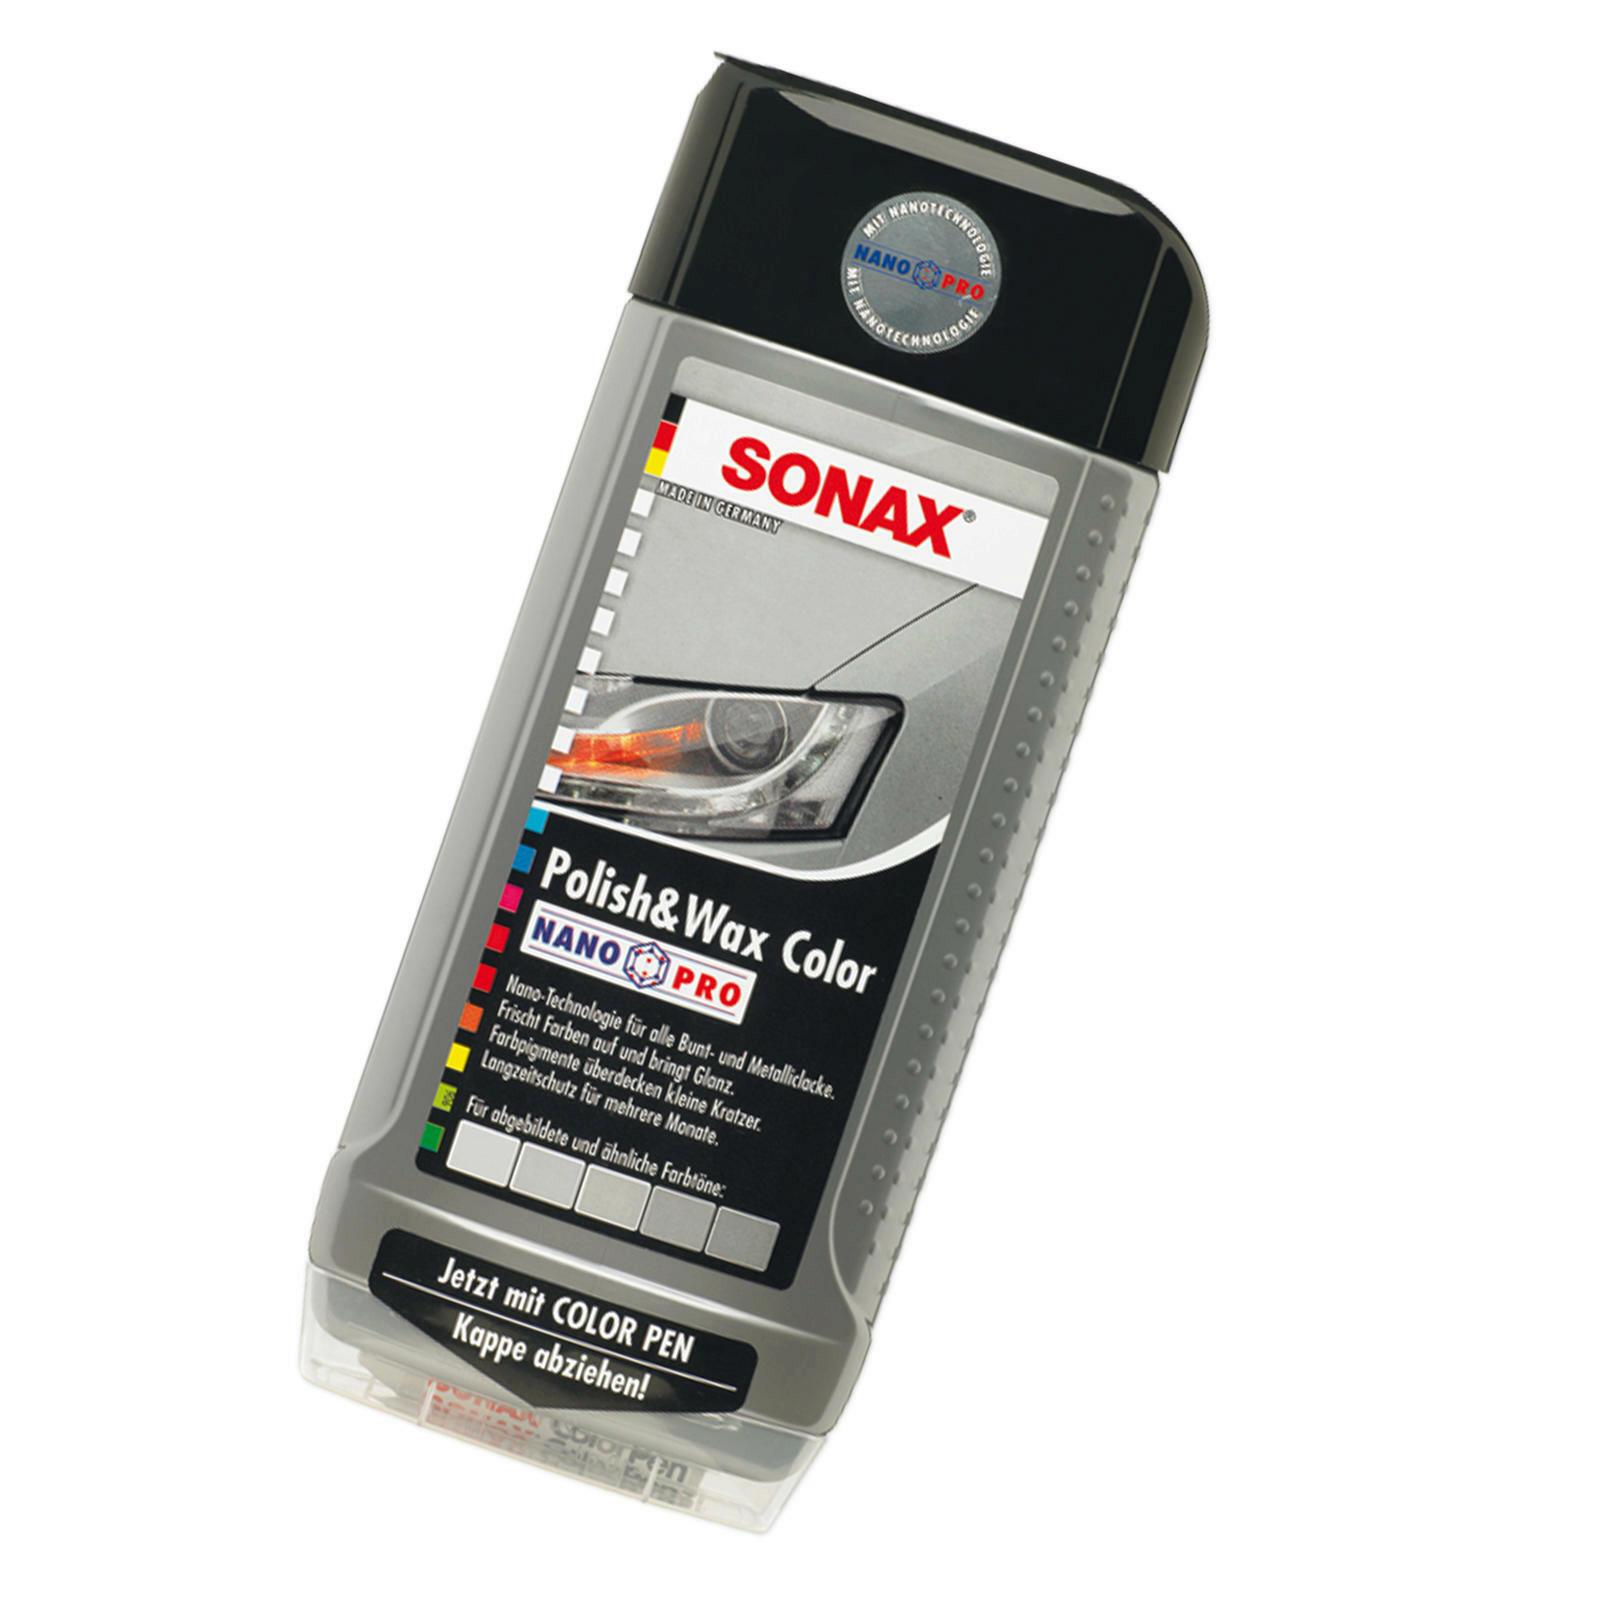 SONAX Polish & Wax Color NanoPro silber/grau 500ml